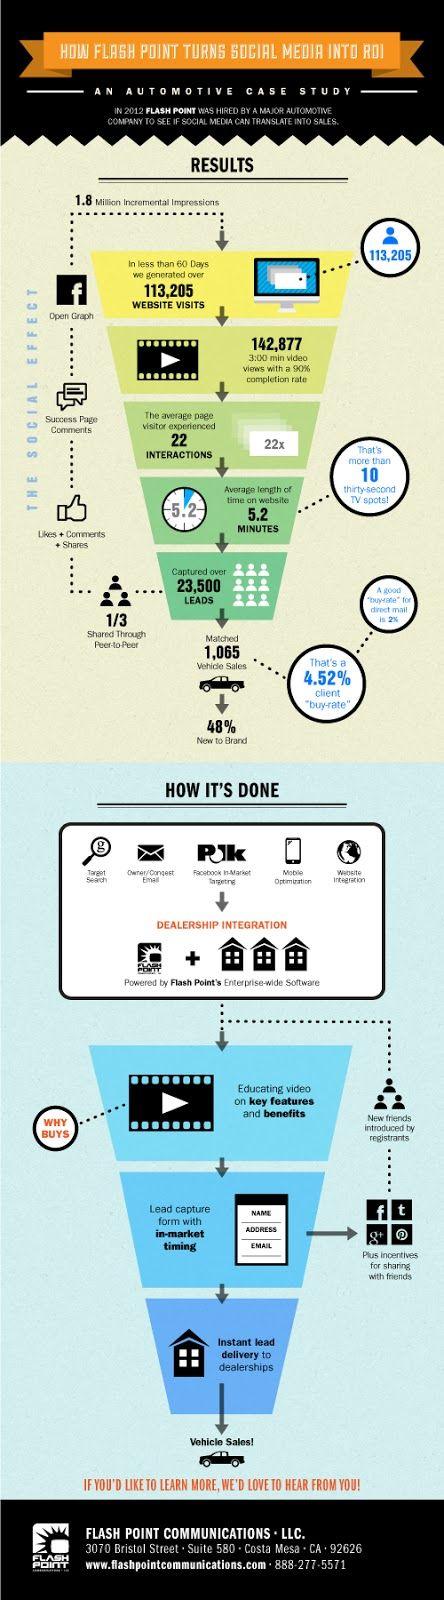 Automotive Case Study: How Flash Point Turns Social Media into ROI - Automotive Digital Marketing Professional Community